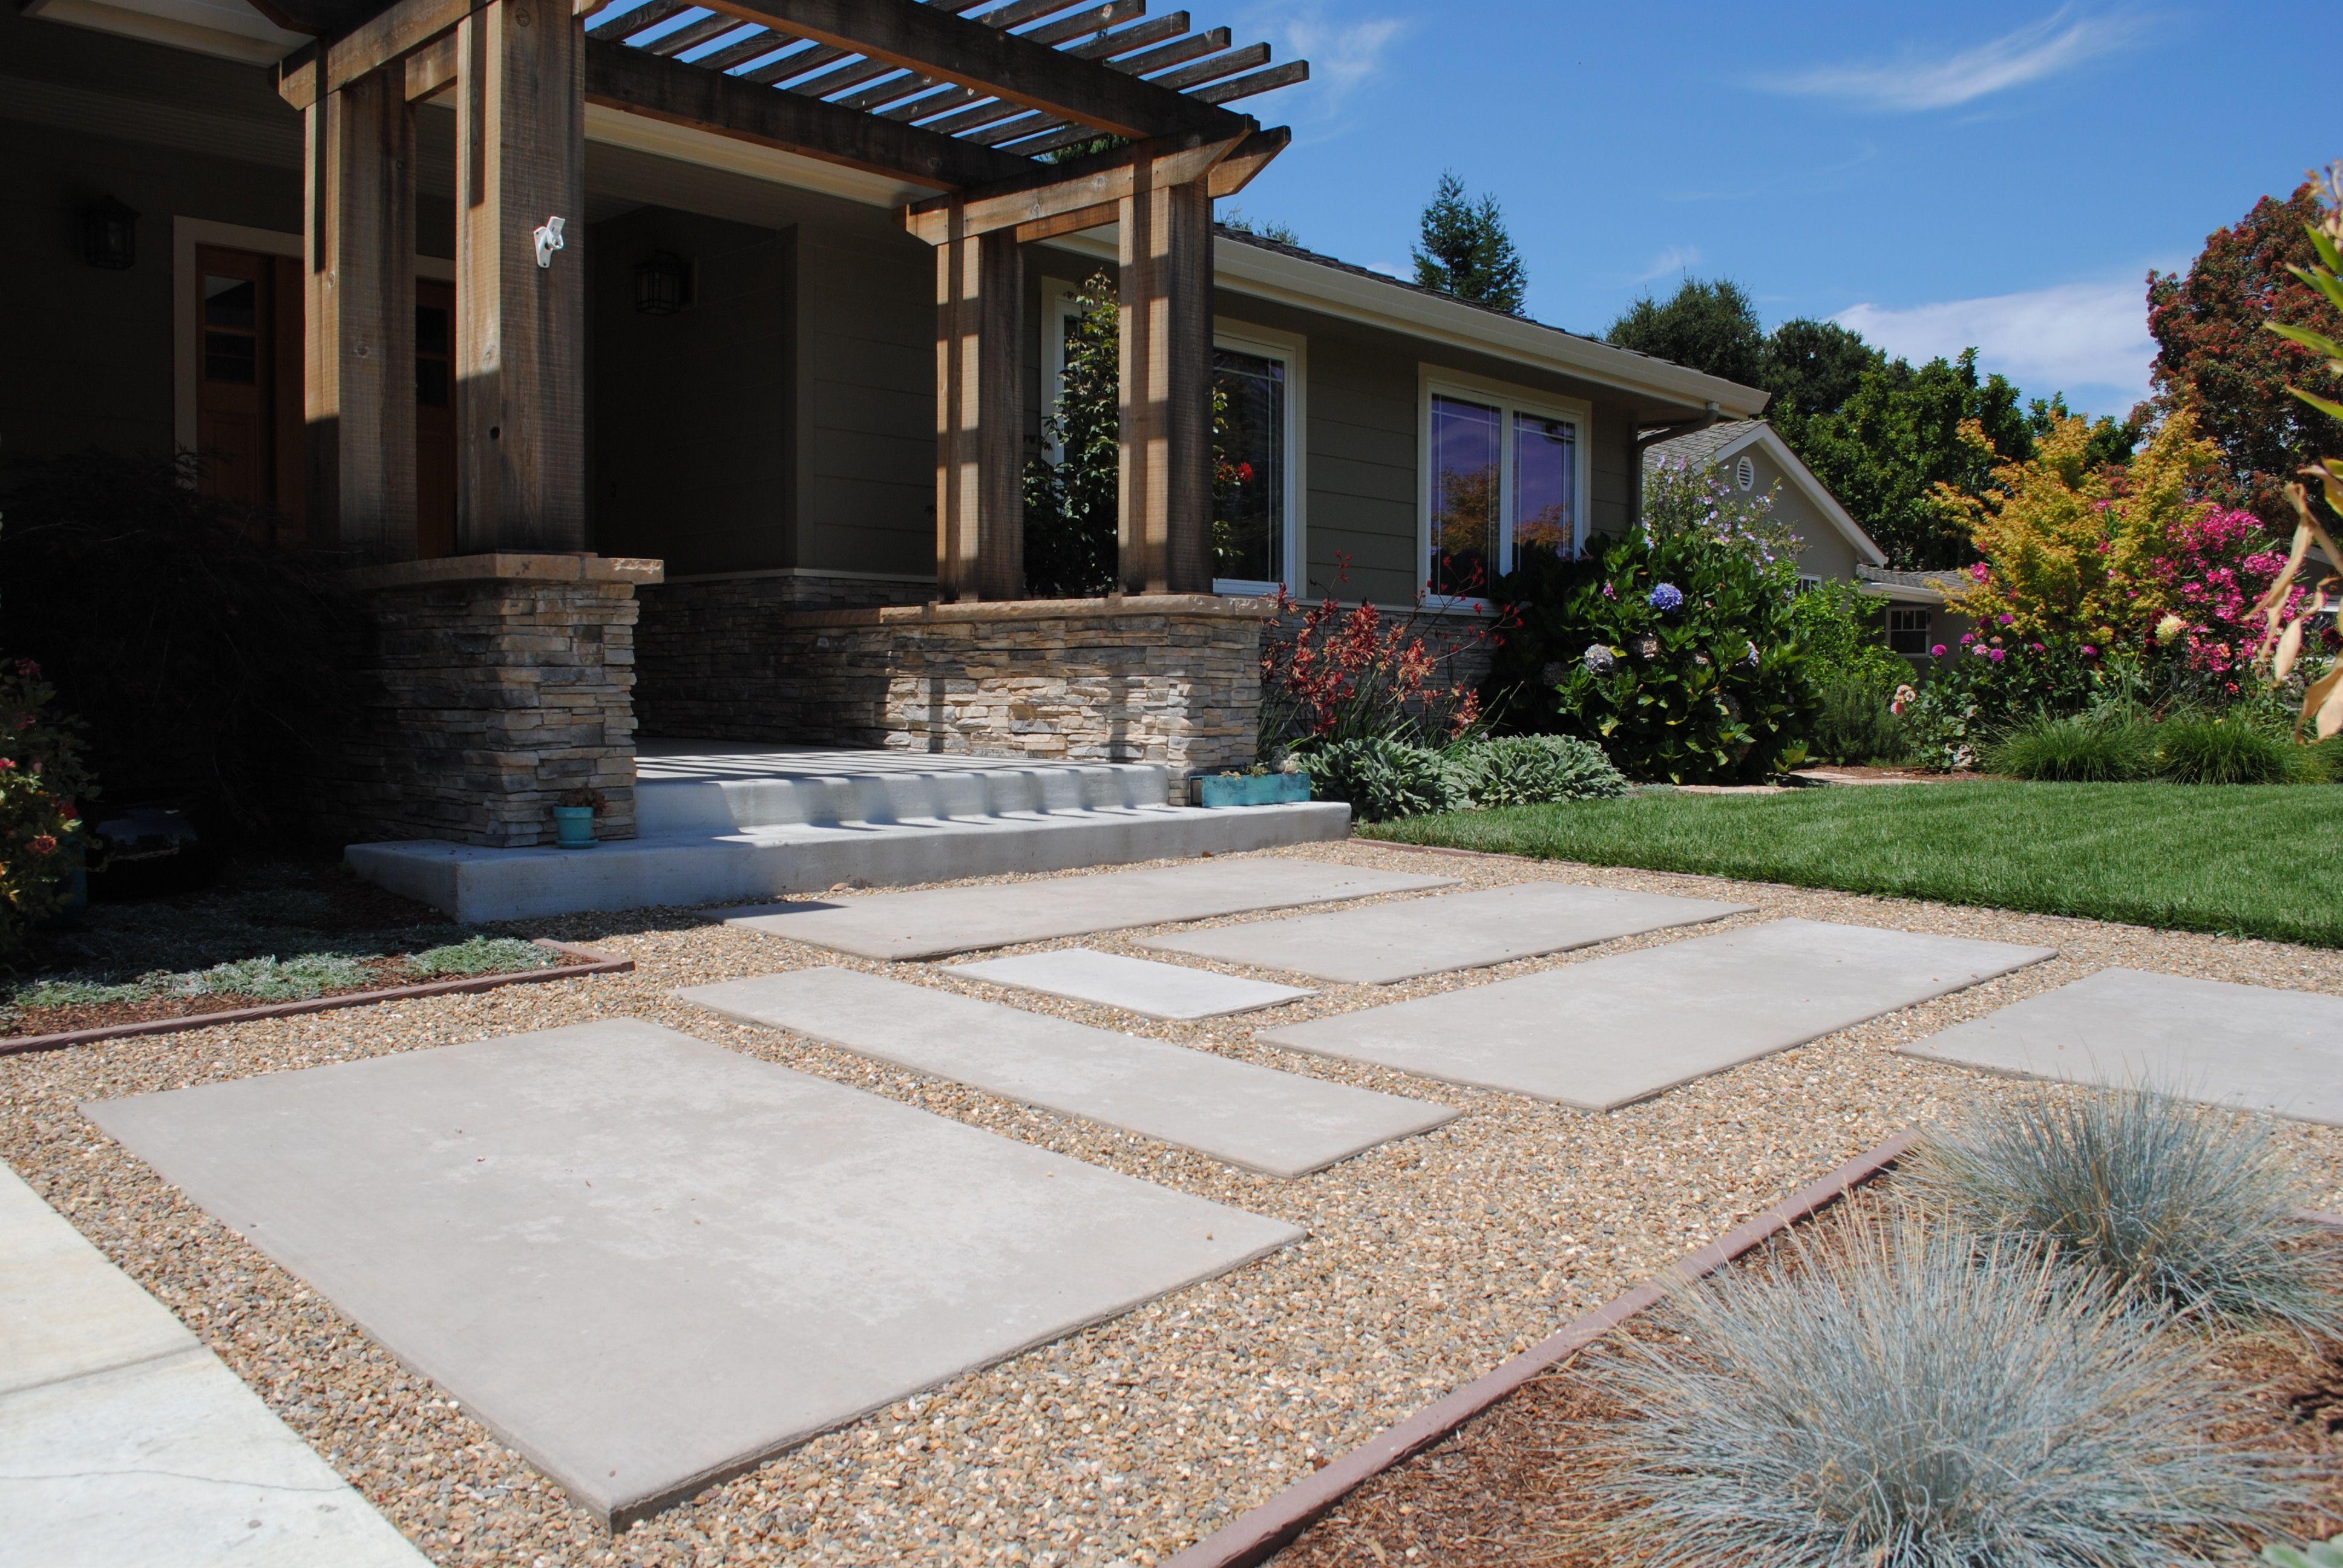 Renovation 3 Front Yard Concrete Ideas On Mountain View ... on Concrete Front Yard Ideas id=54999